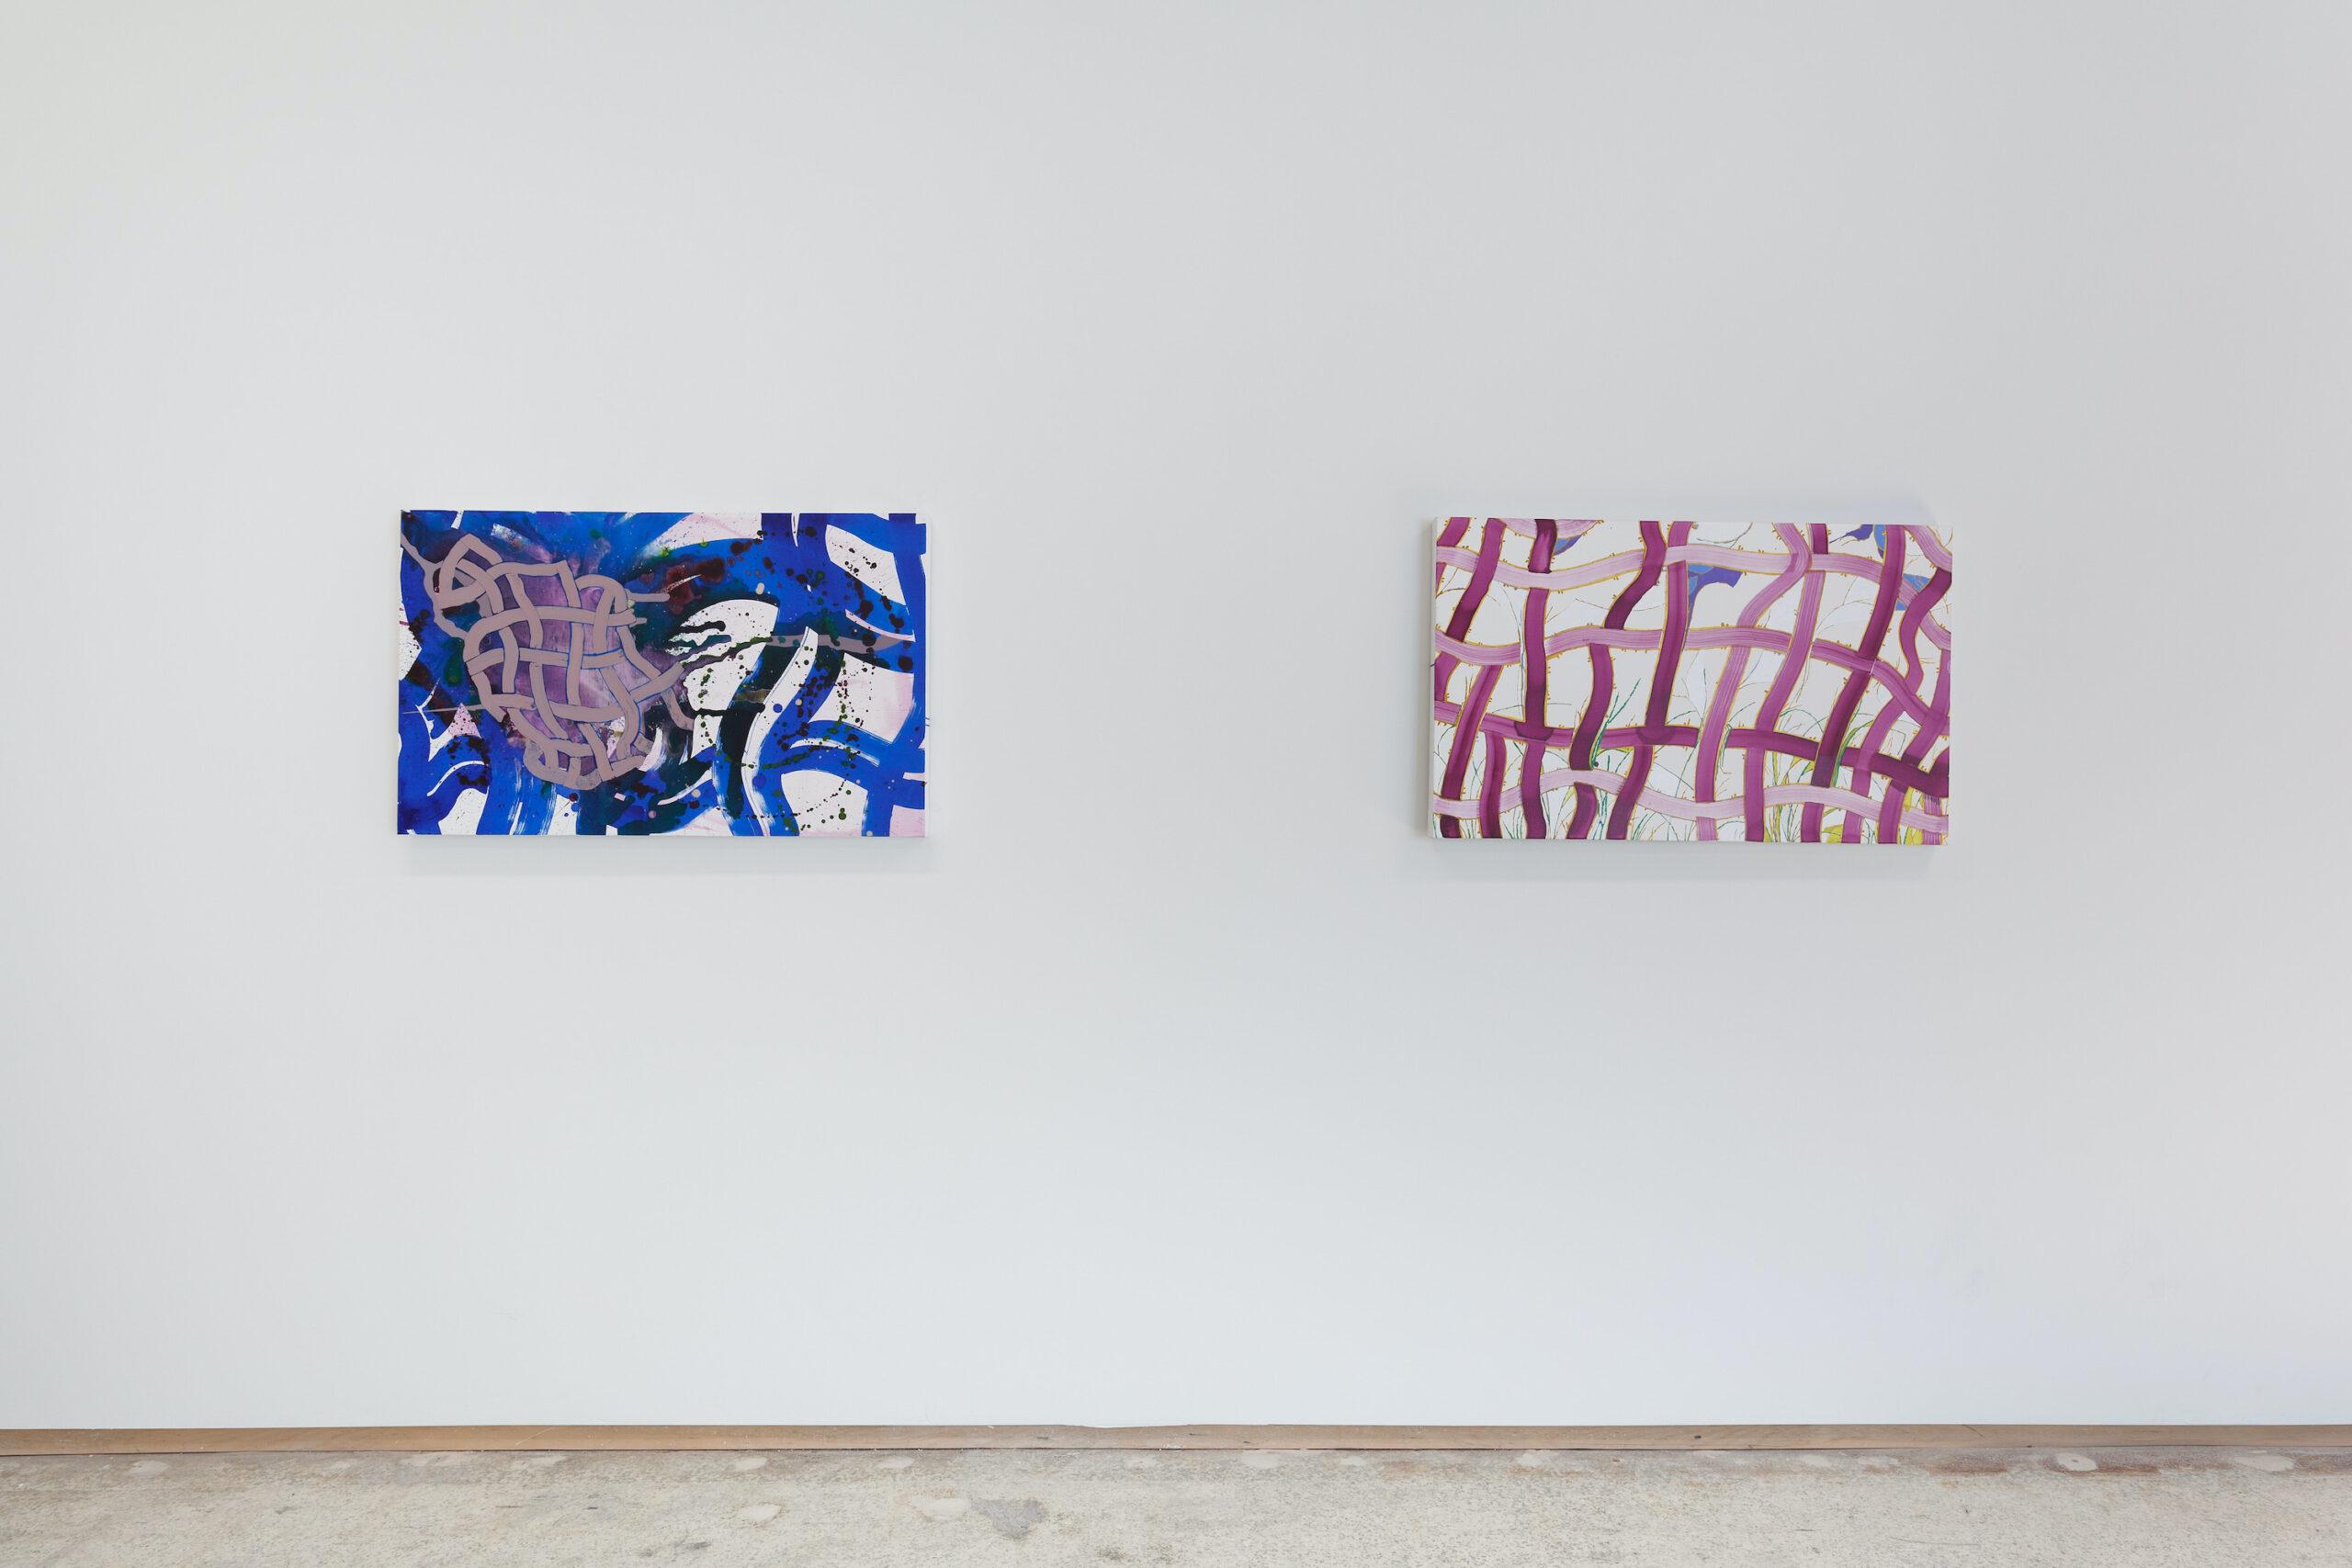 Elisabeth Condon, New Works (installation view), 2021